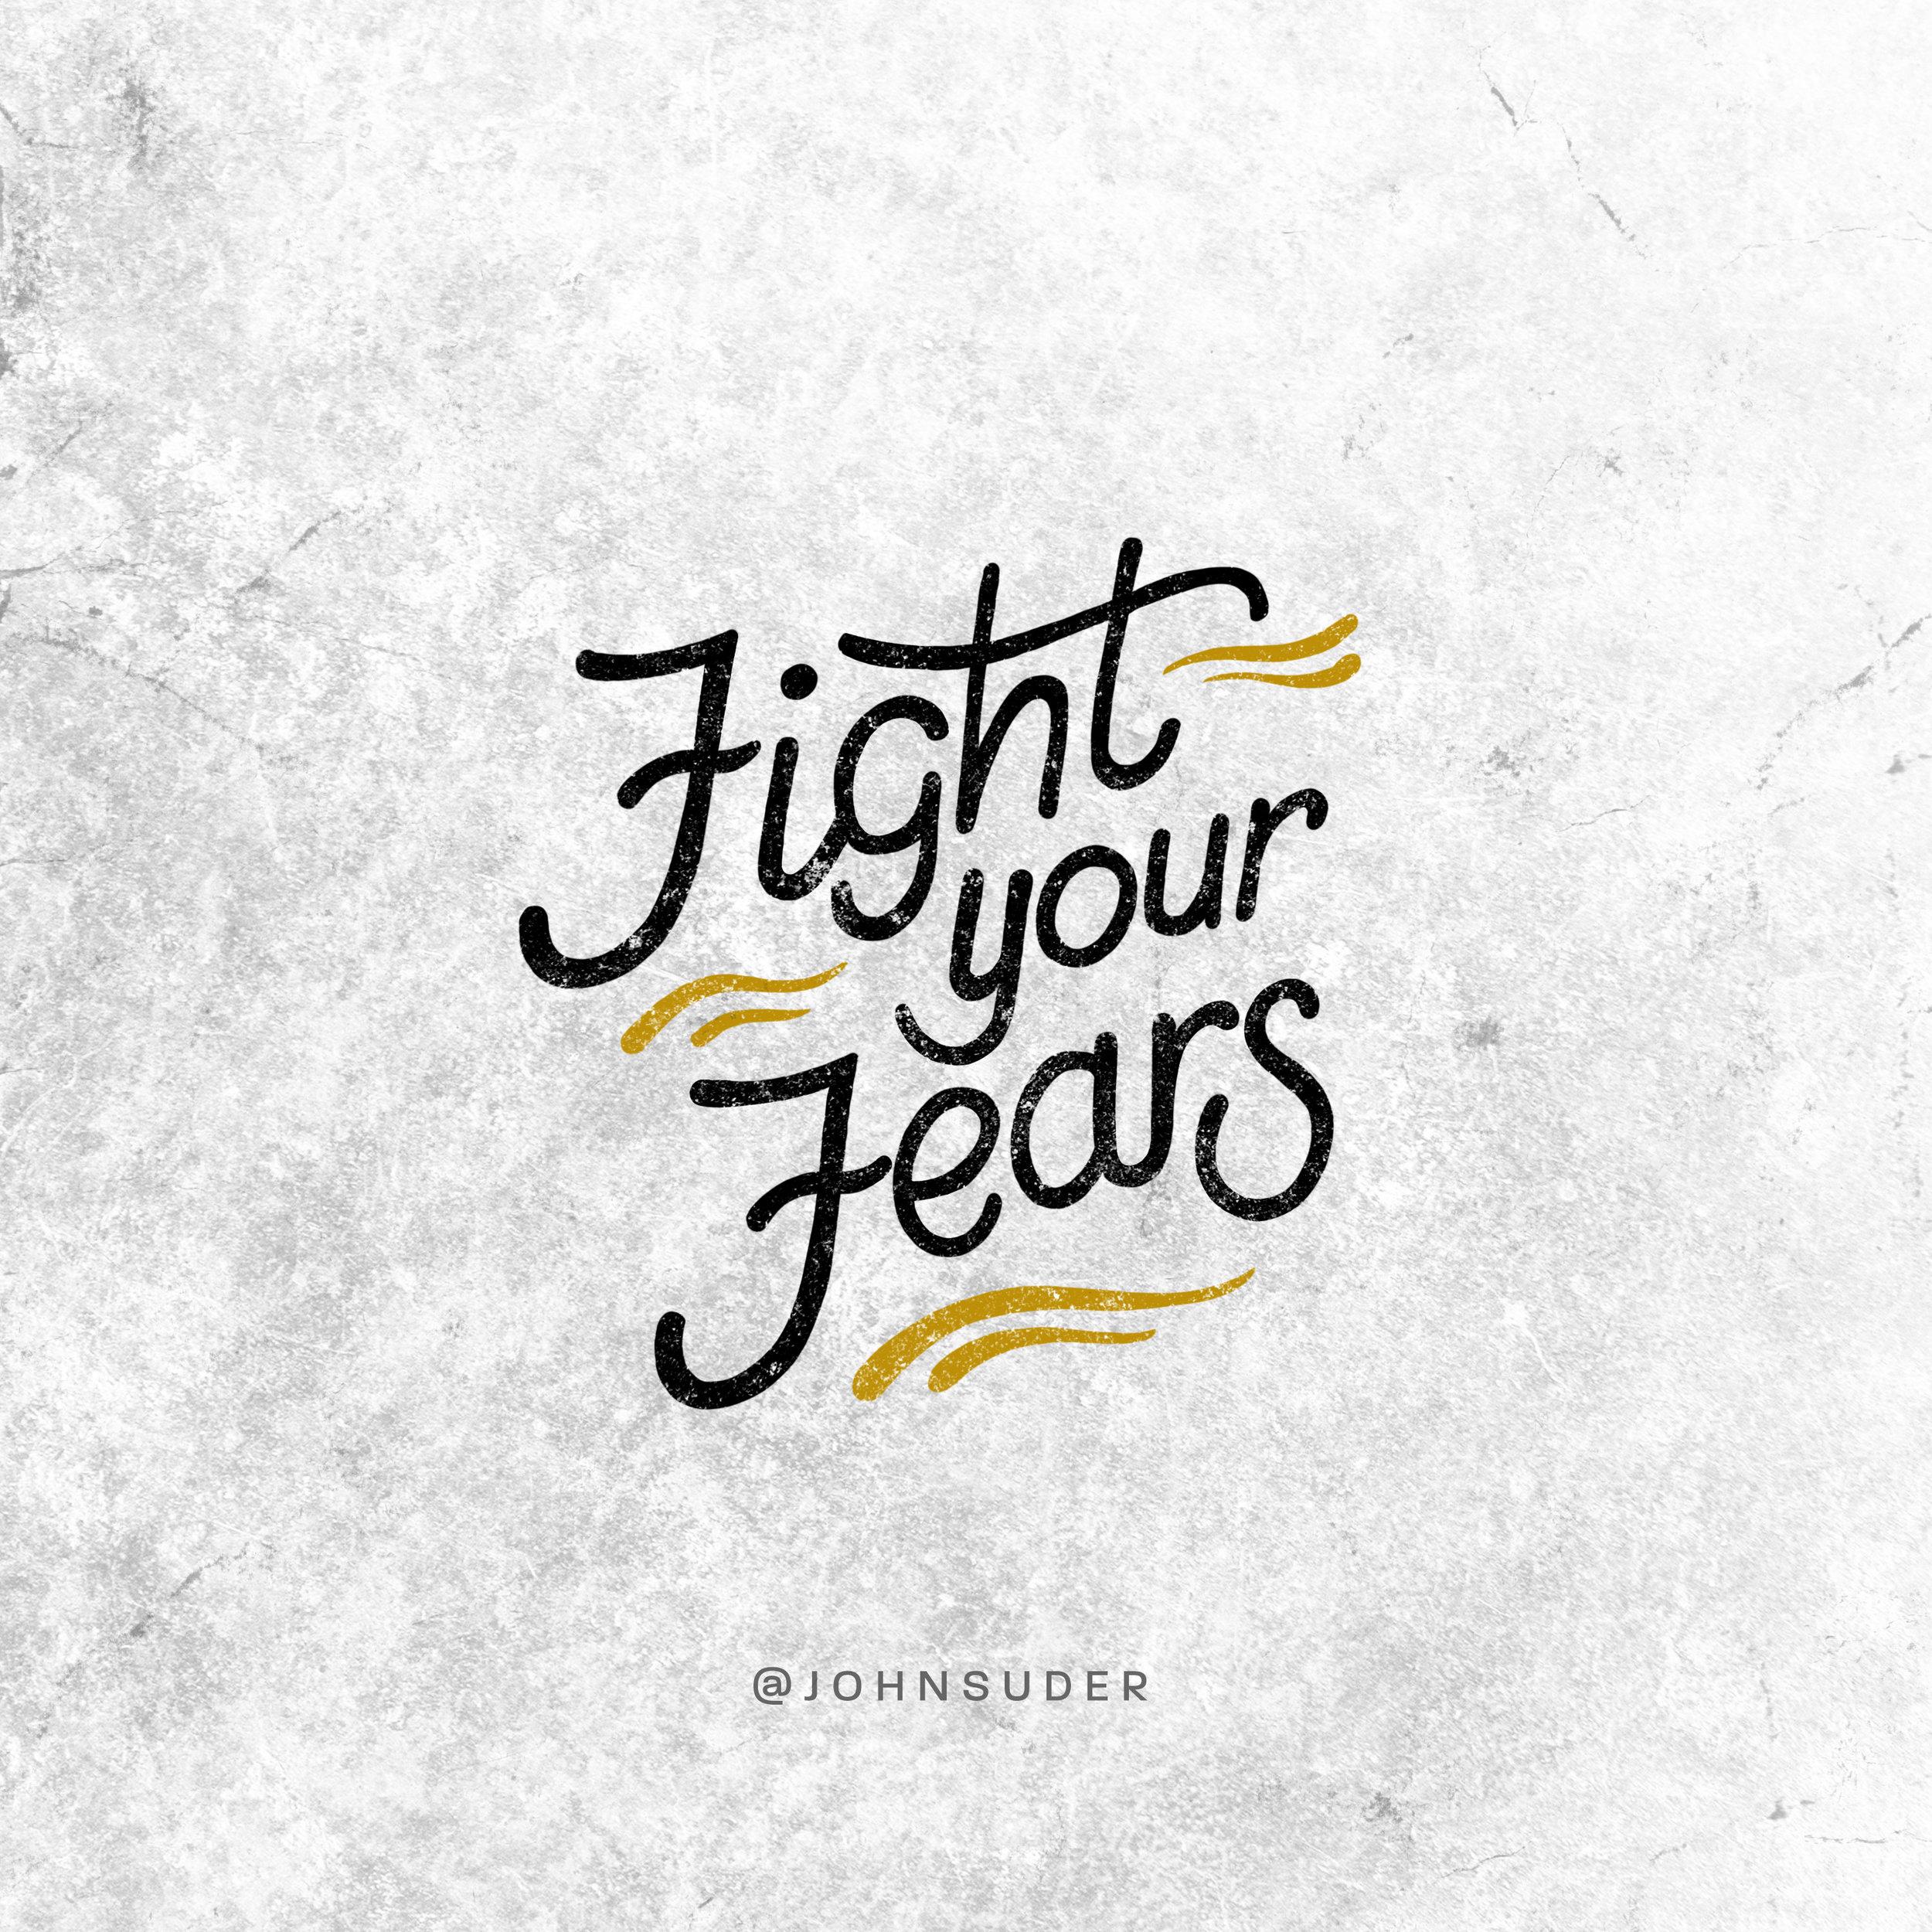 fight your fears john suder.jpg